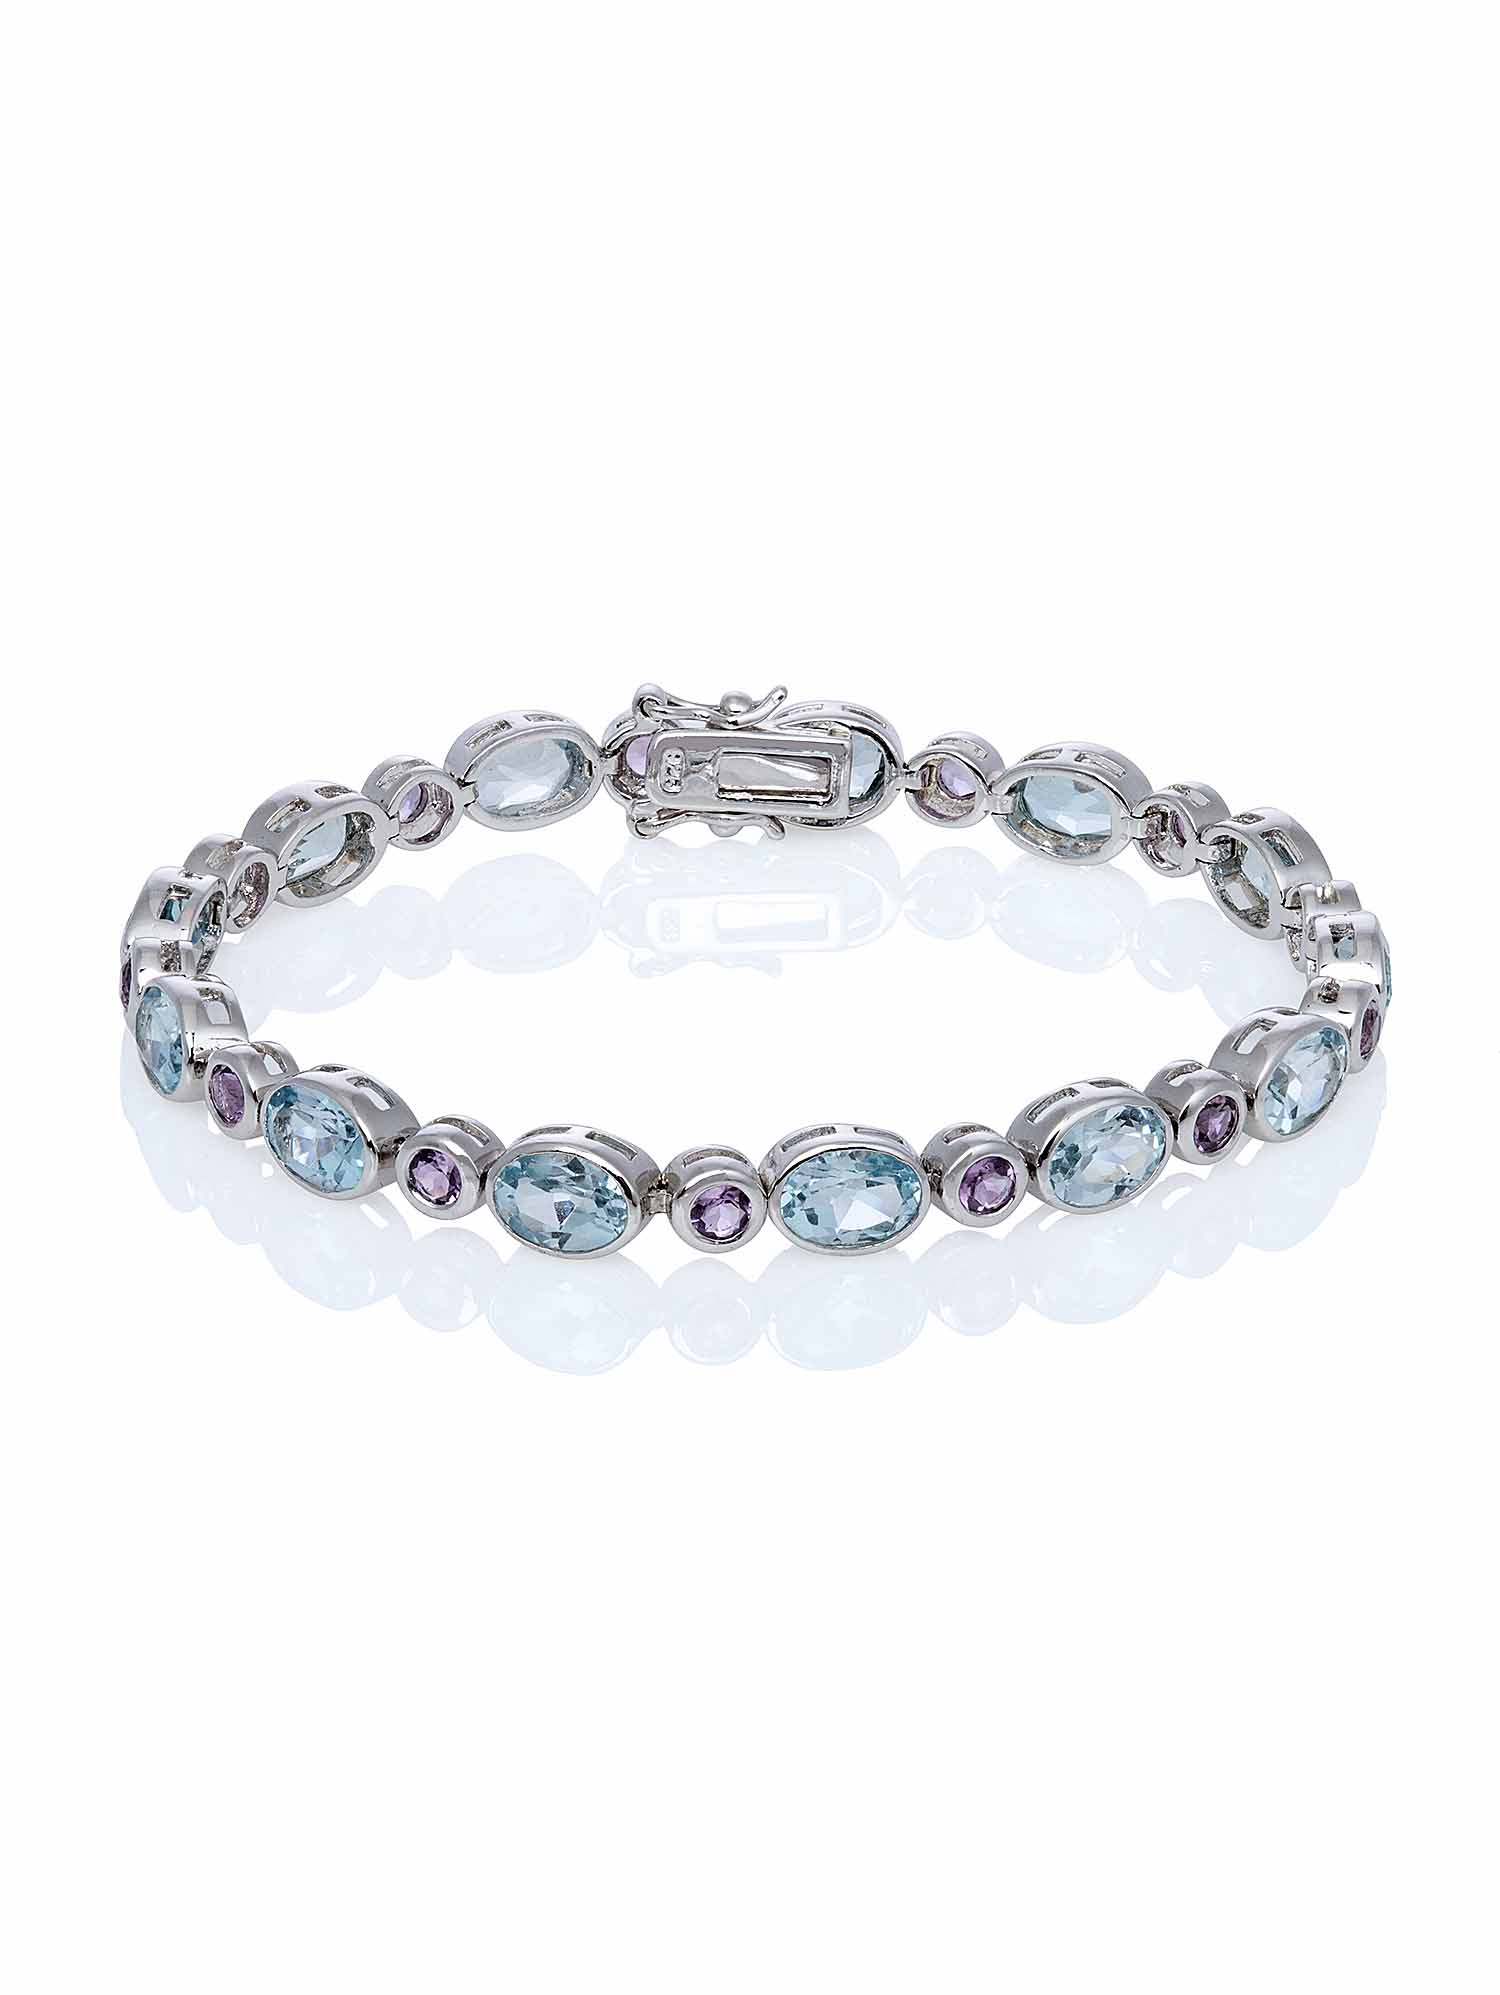 "Blue Topaz and Amethyst Platinum Plated Sterling Silver Bezel Set Bracelet, 7.25"" by Generic"